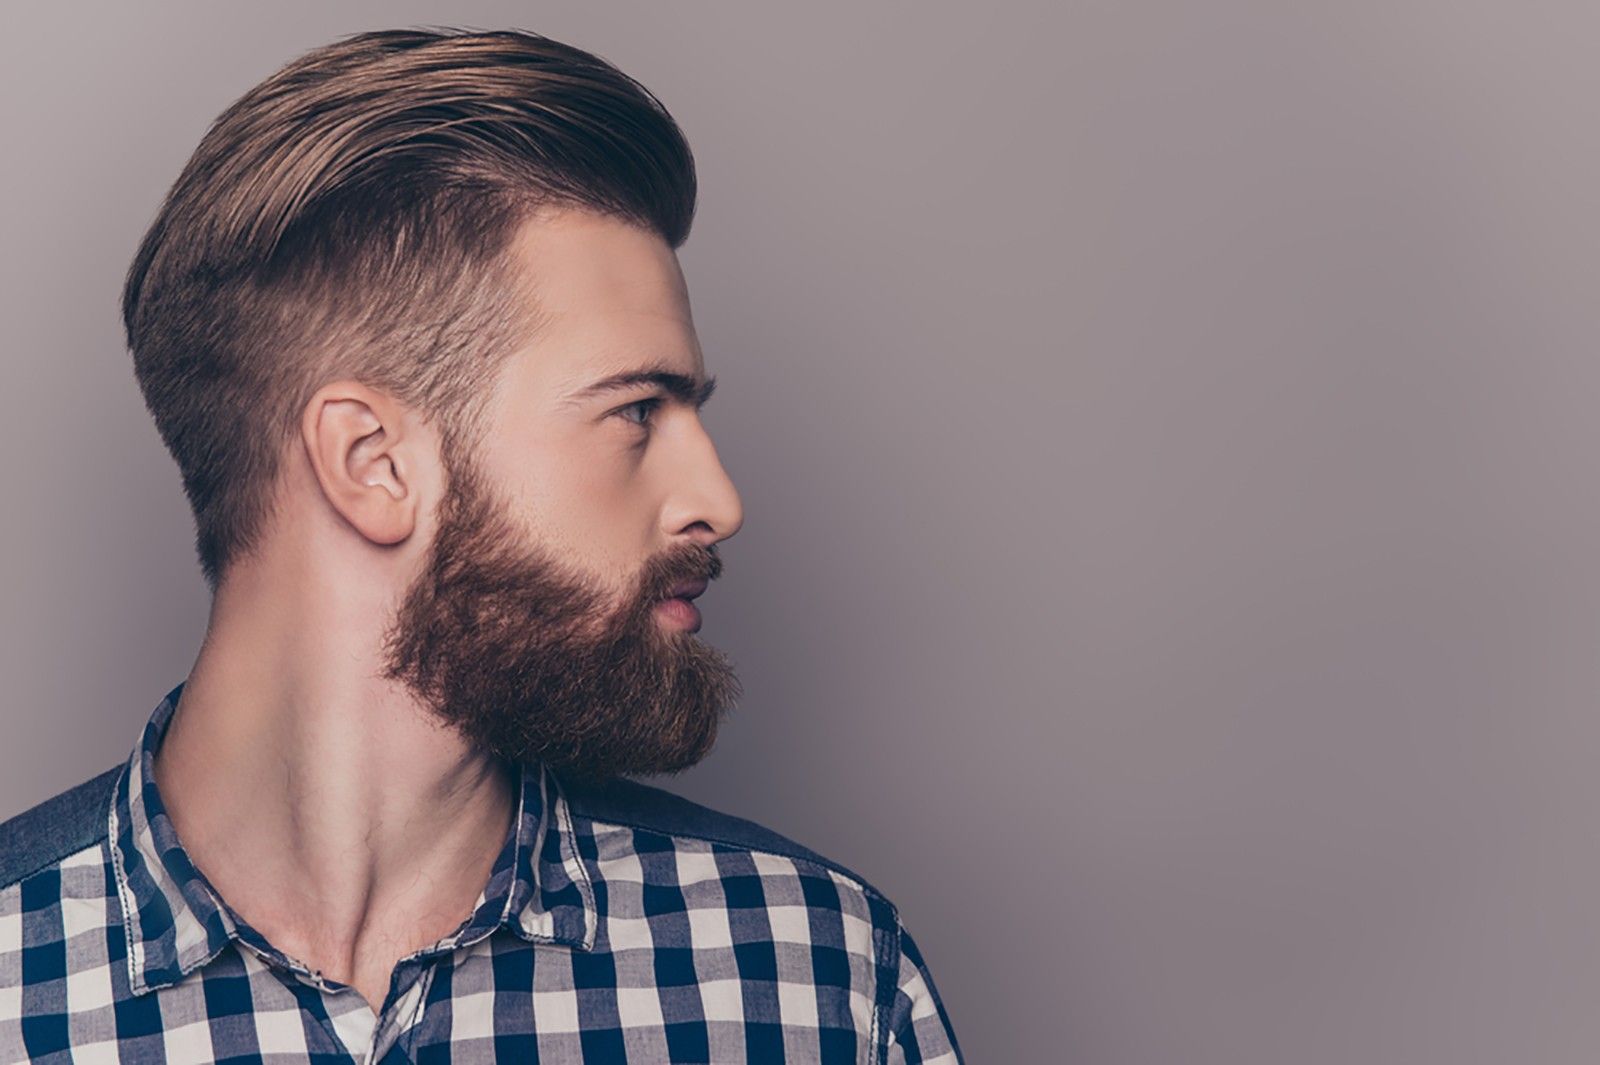 Productos peluqueria - Hombre